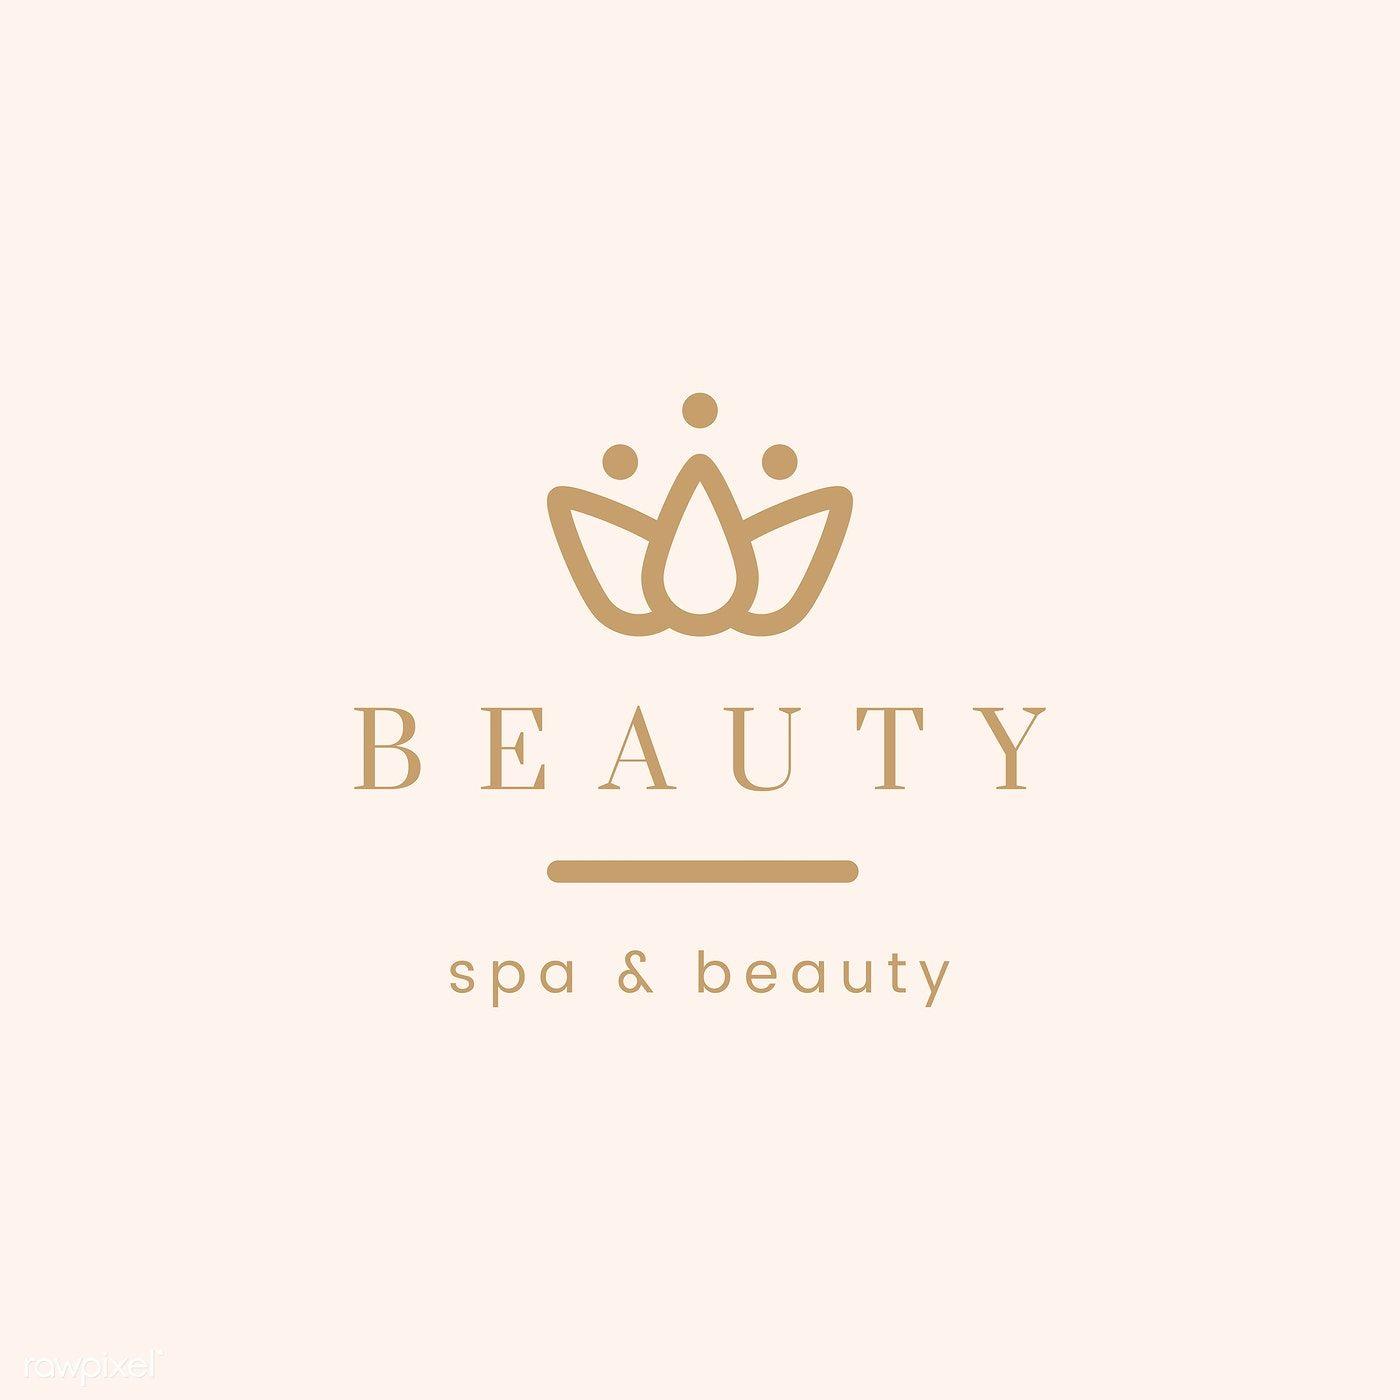 Beauty And Spa Logo Vector Free Image By Rawpixel Com Ningzk V Spa Logo Spa Logo Design Vector Logo